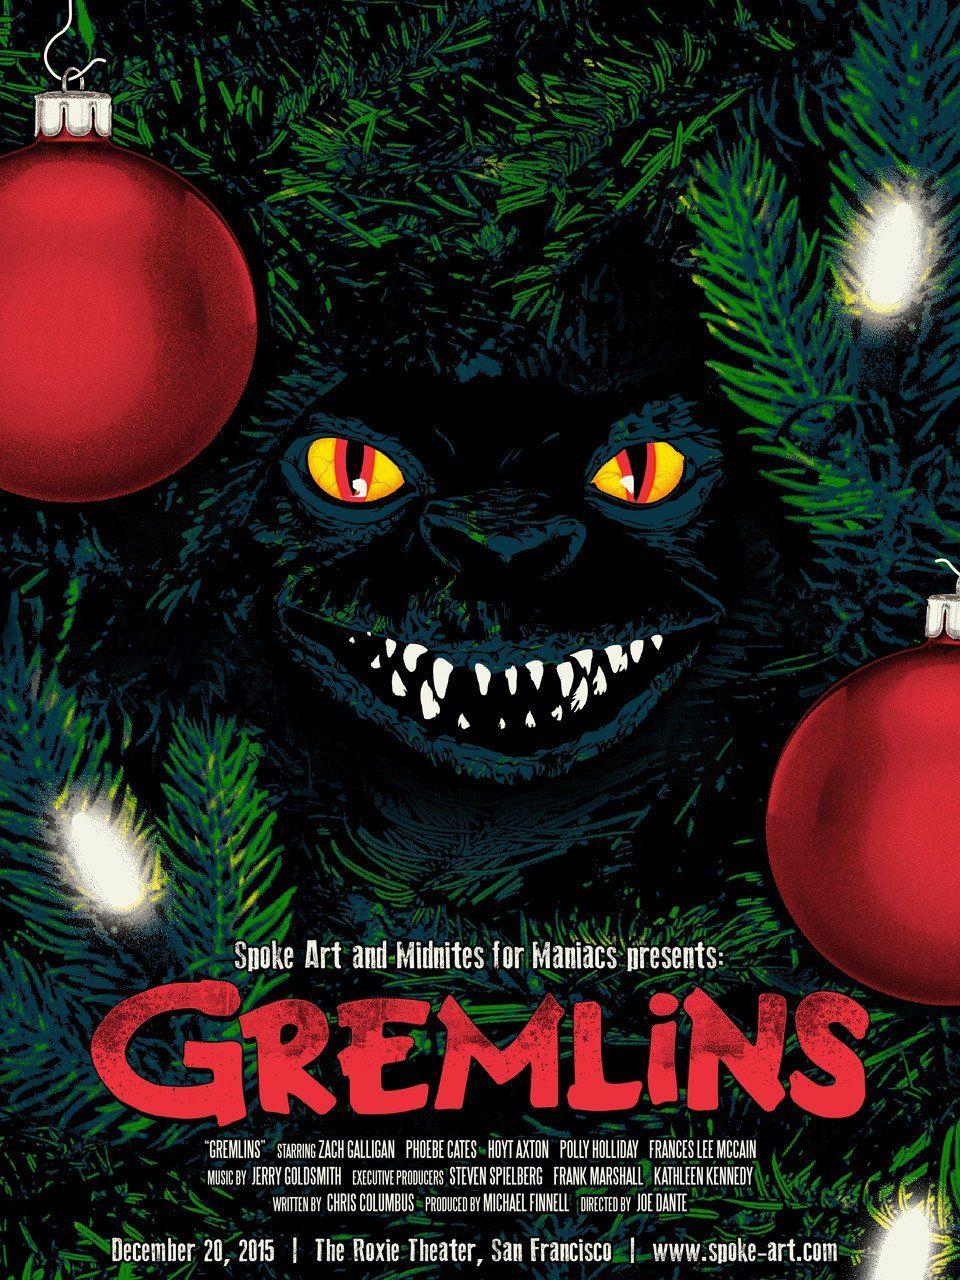 Joshua Budich Gremlins Gremlins Art Screen Print Poster